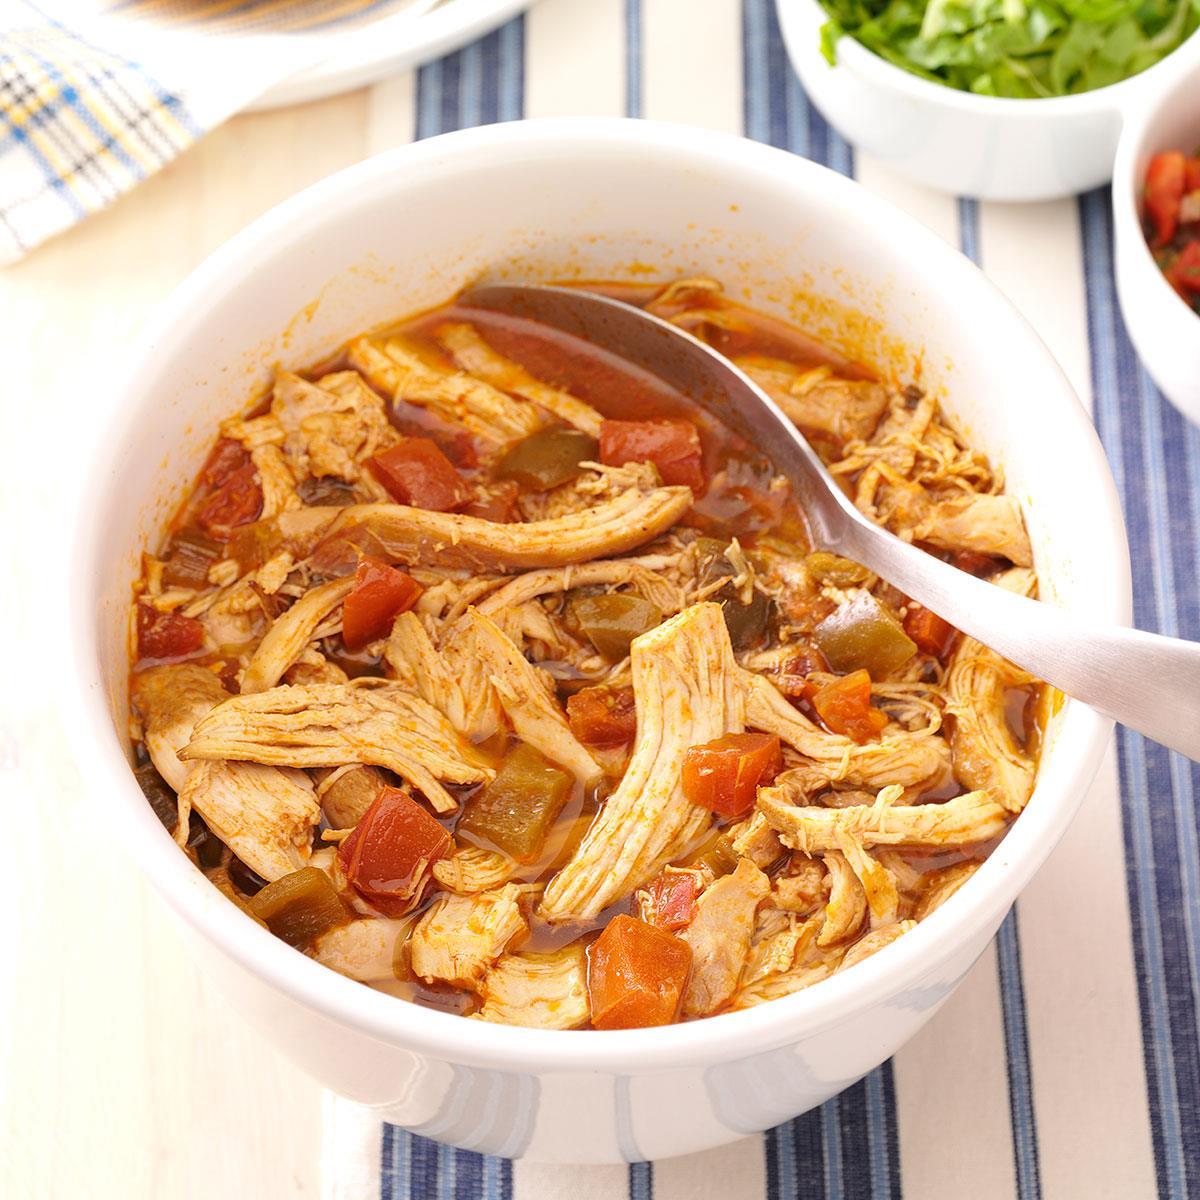 Spicy Shredded Chicken Recipe Taste Of Home